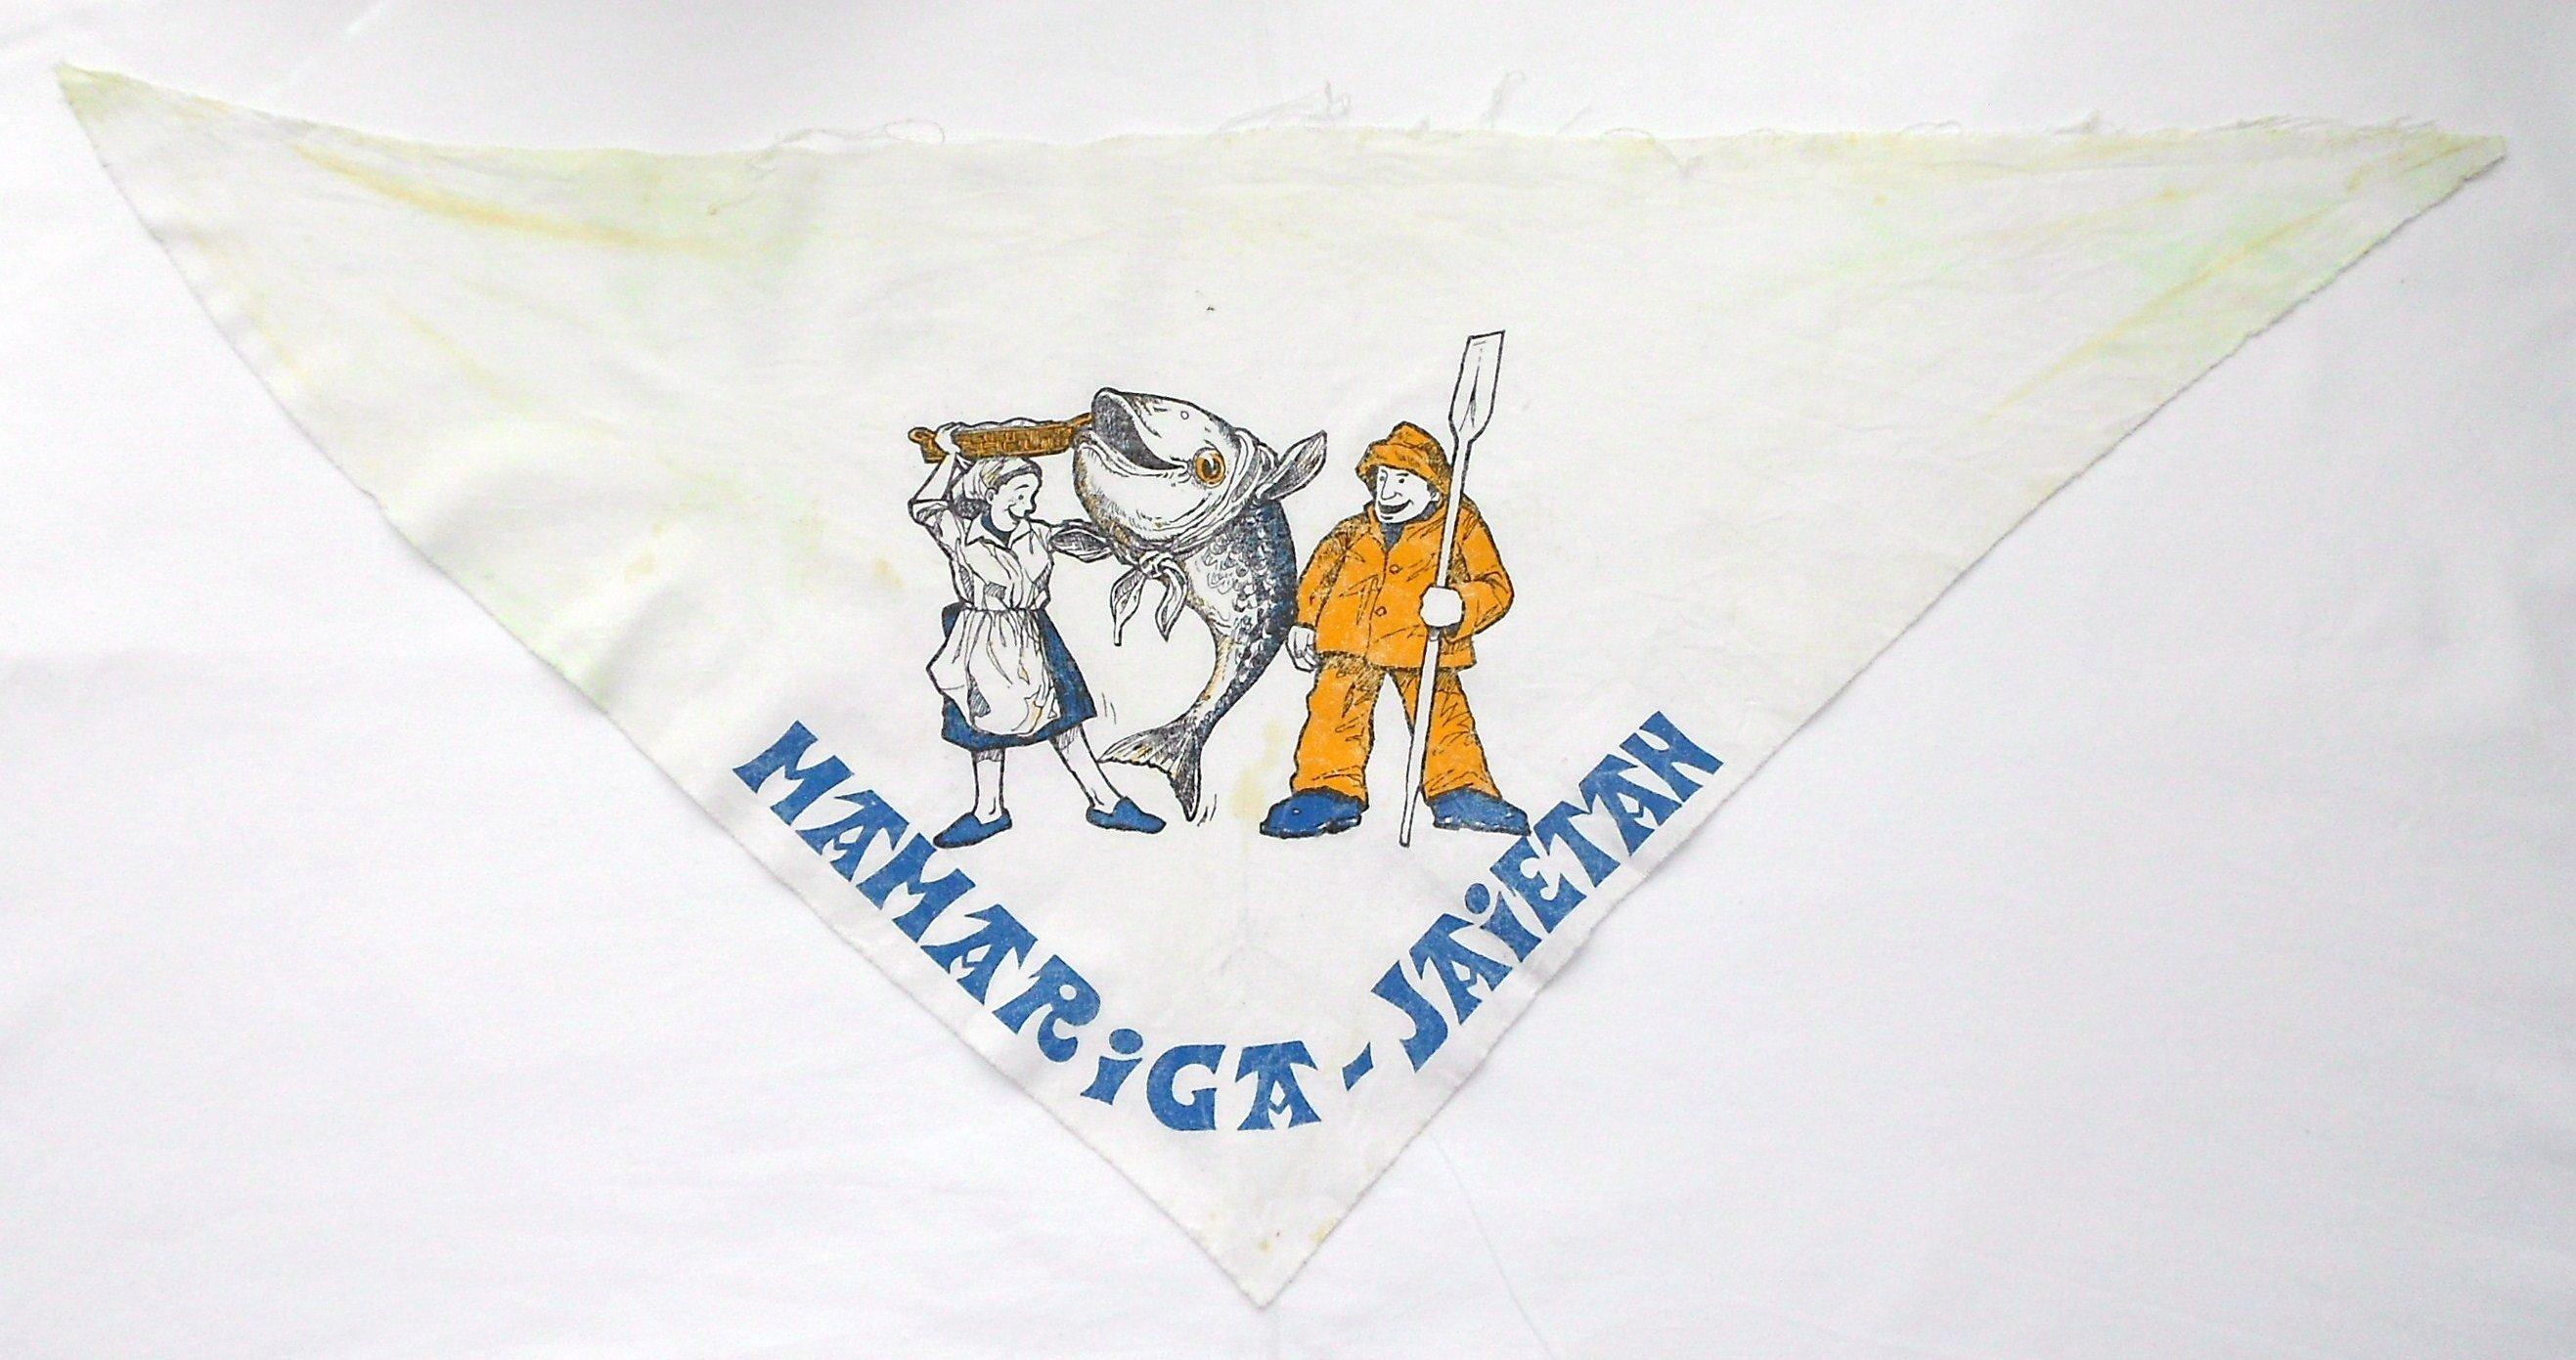 Pañuelo 1981 (fecha probable)